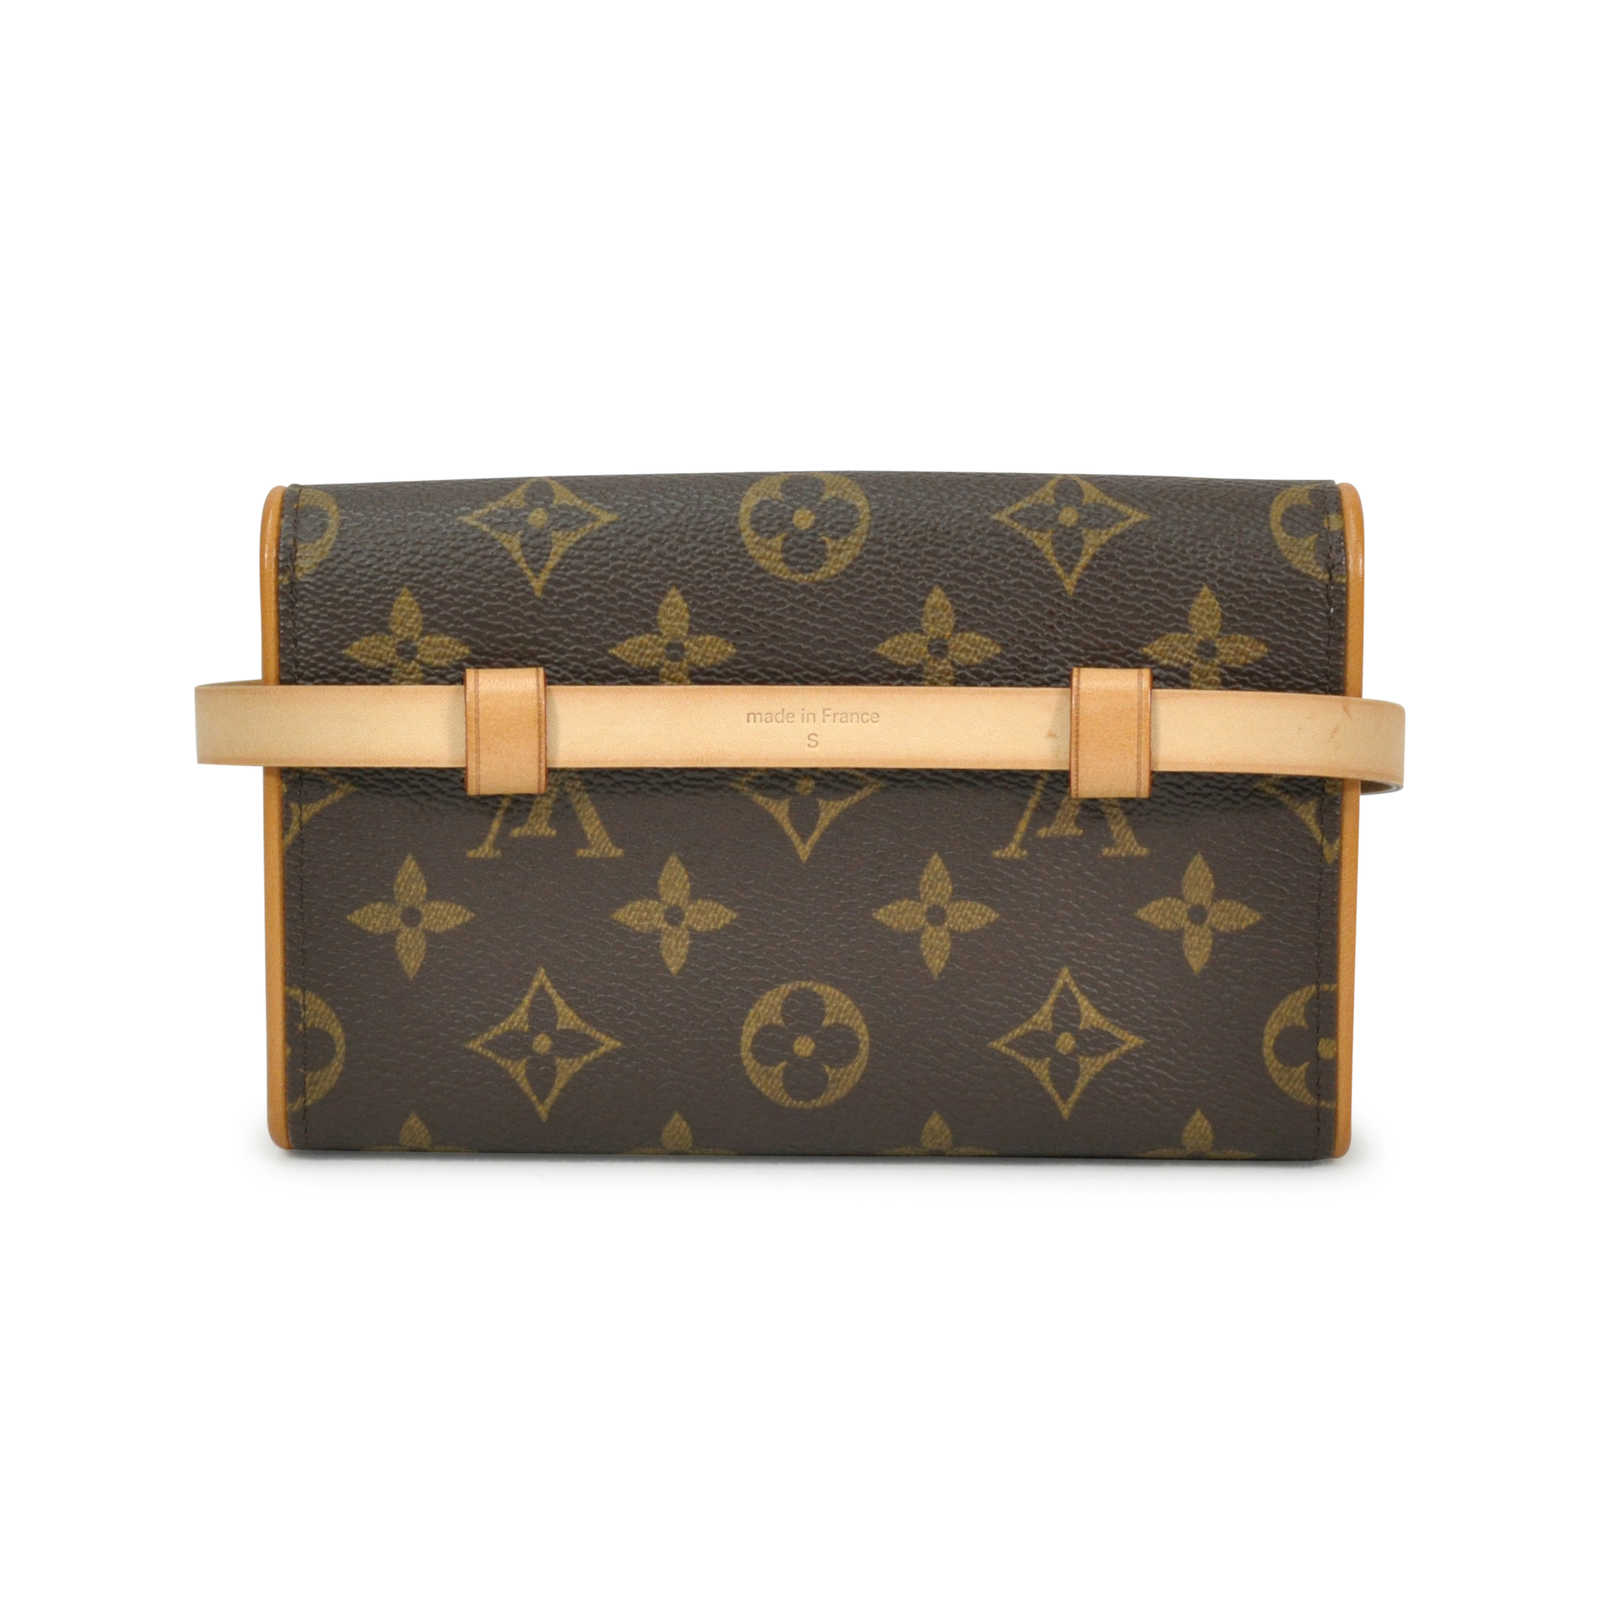 5becd1c67965 ... Authentic Second Hand Louis Vuitton Pochette Florentine Waist Pouch  (PSS-298-00002) ...